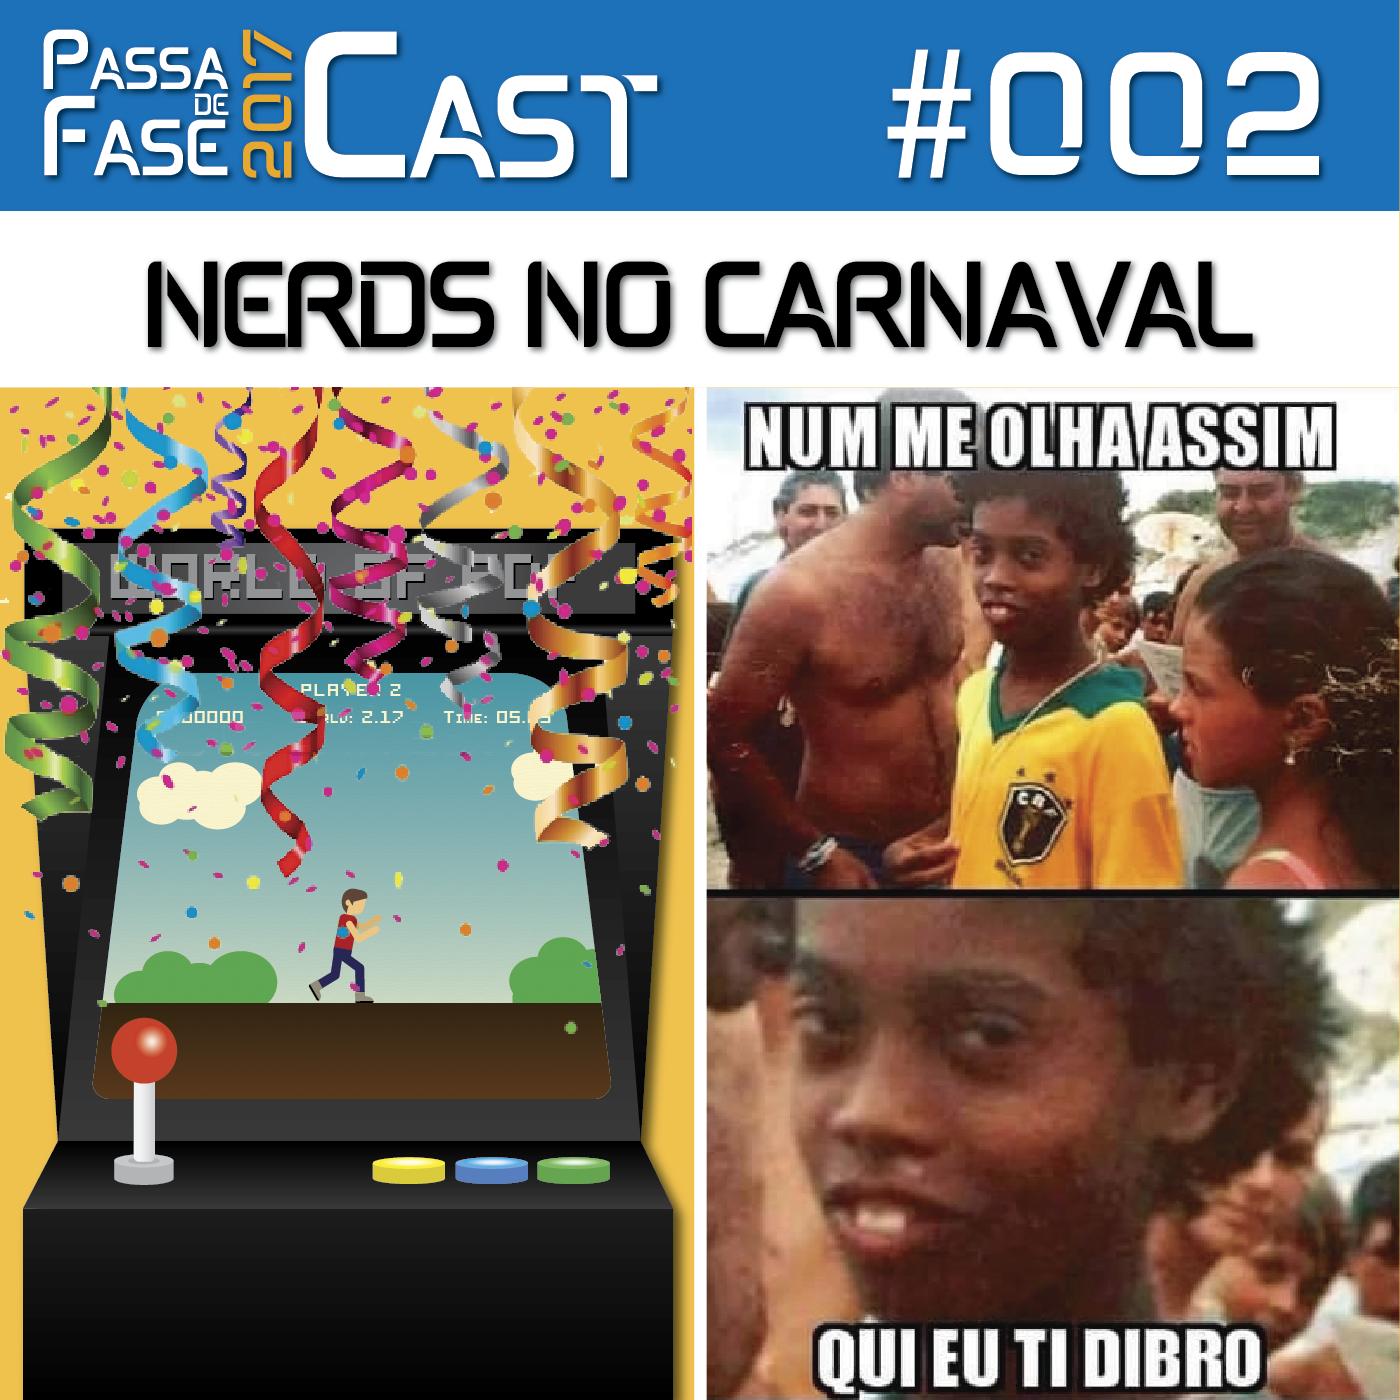 Passa de Fase Cast 2017 #002 | NERDS NO CARNAVAL